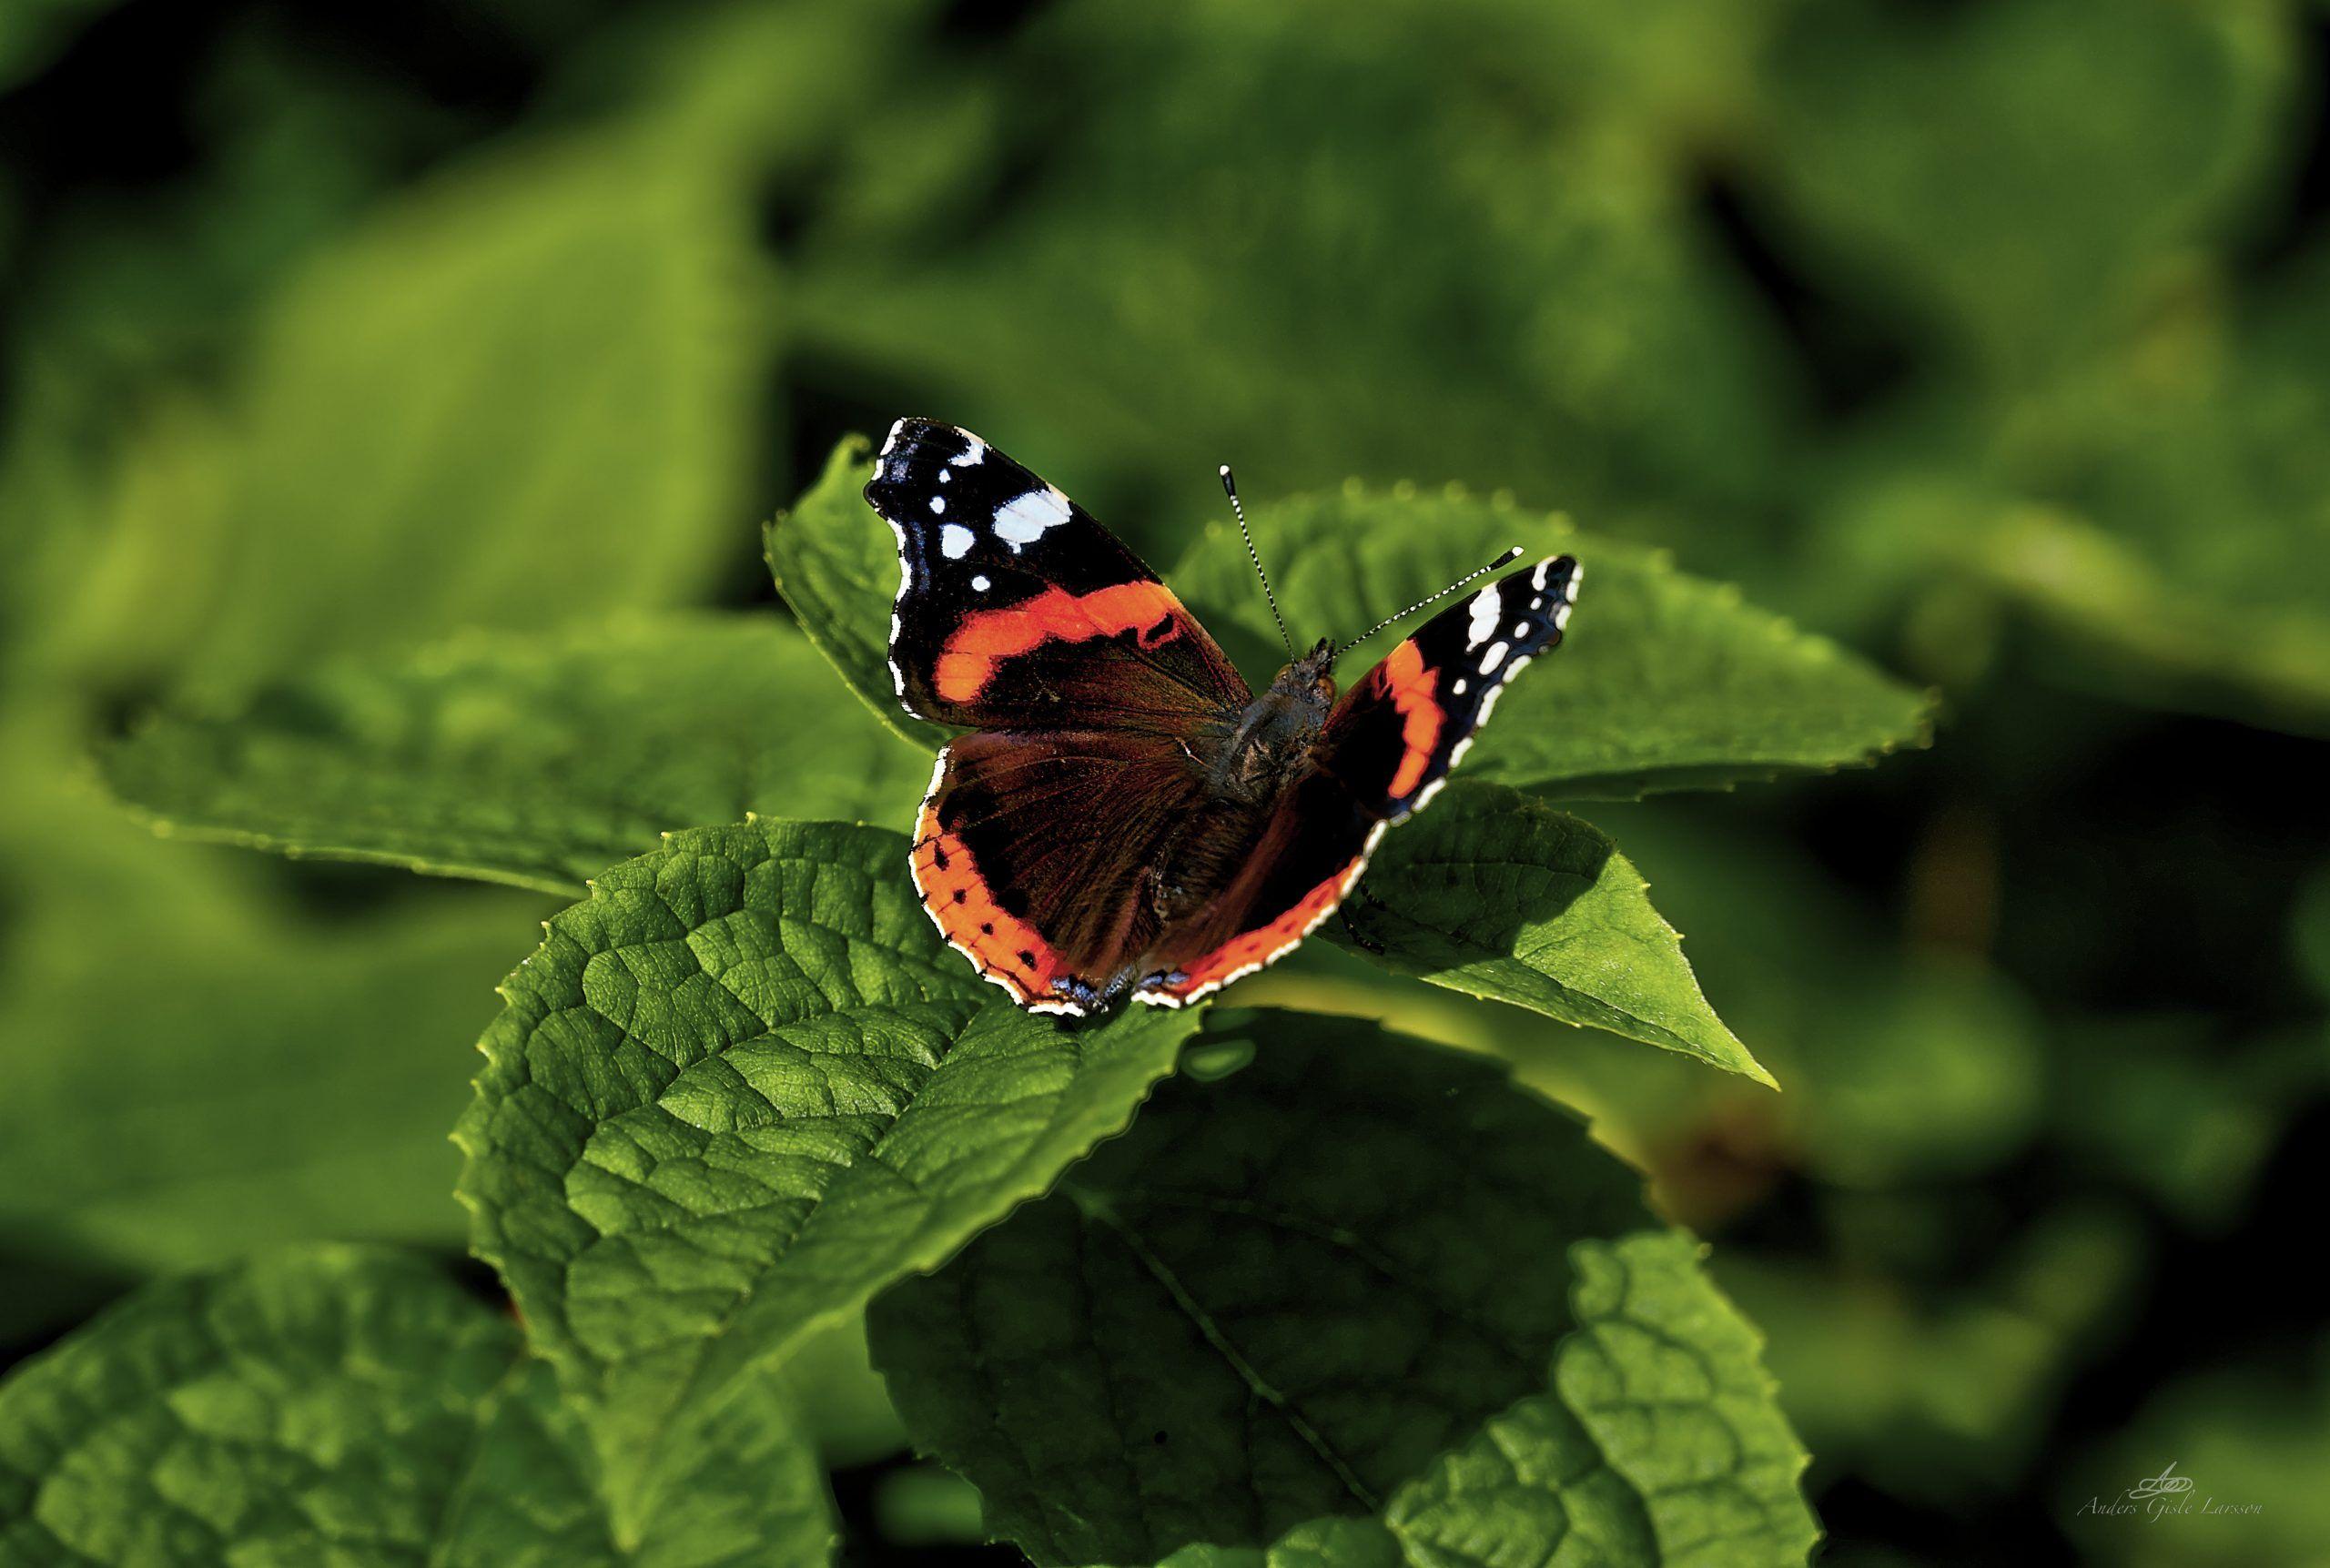 363/365, Admiral sommerfugl, Assentoft, Randers